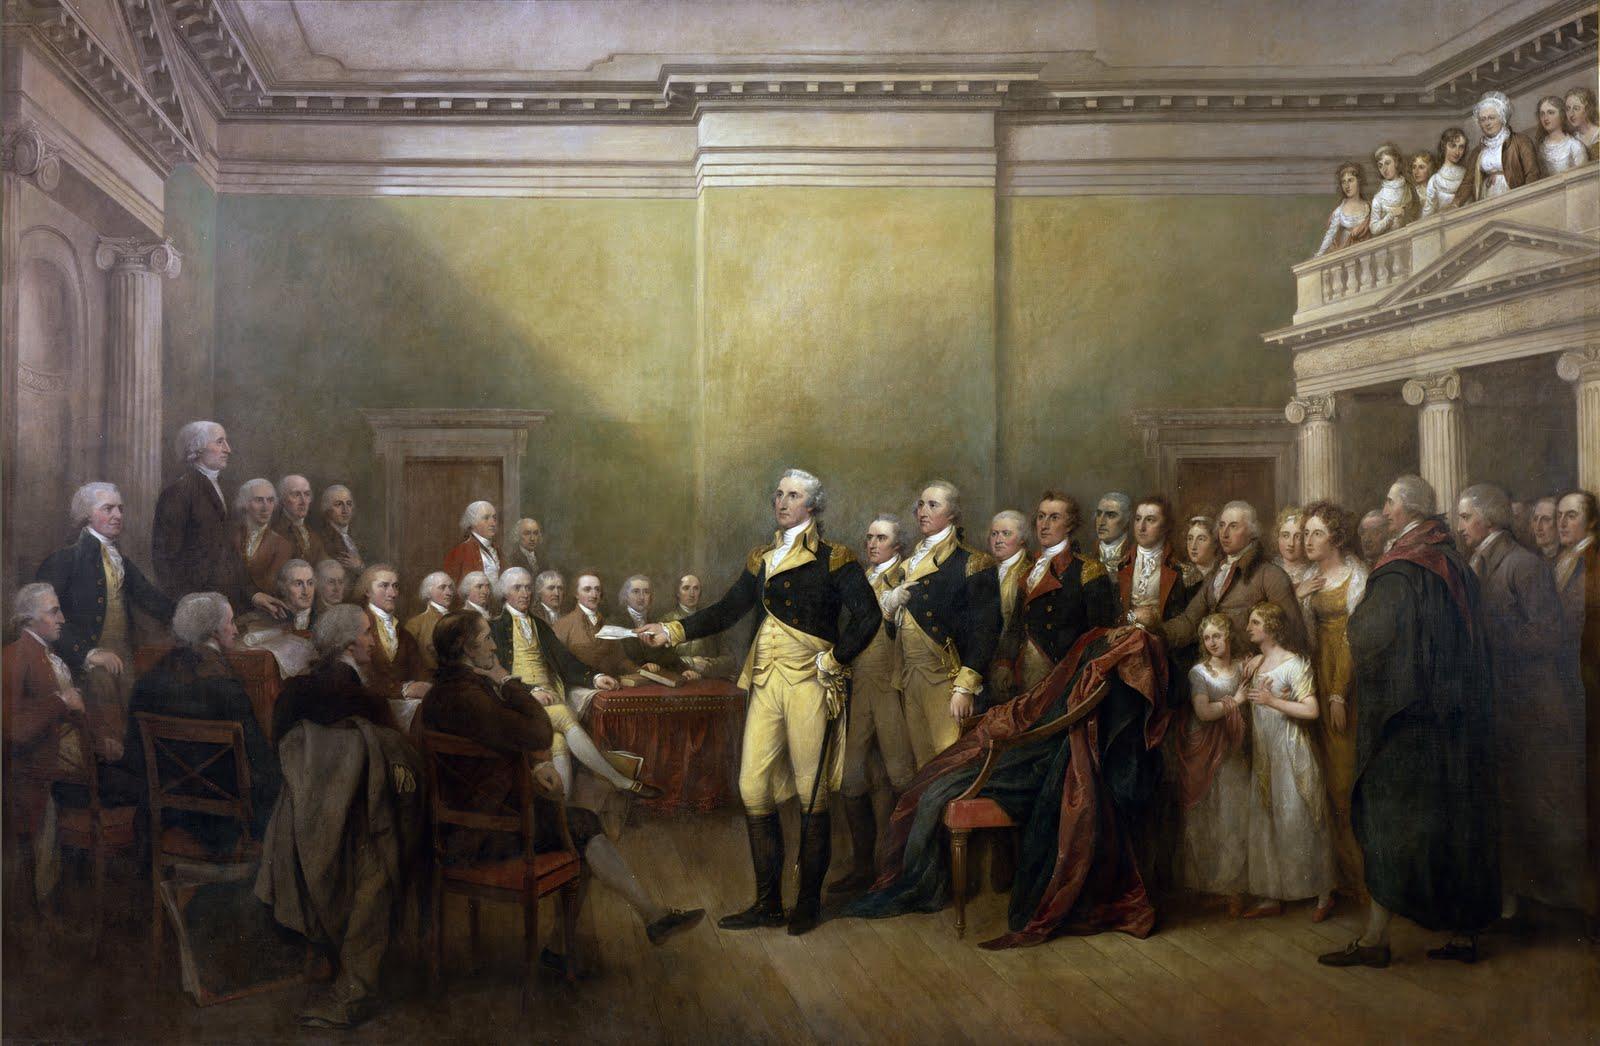 http://2.bp.blogspot.com/-mJCBfeseXPk/TWEnUeoB52I/AAAAAAAAGkE/EicMM30VO9Y/s1600/General_George_Washington_Resigning_his_Commission.jpg